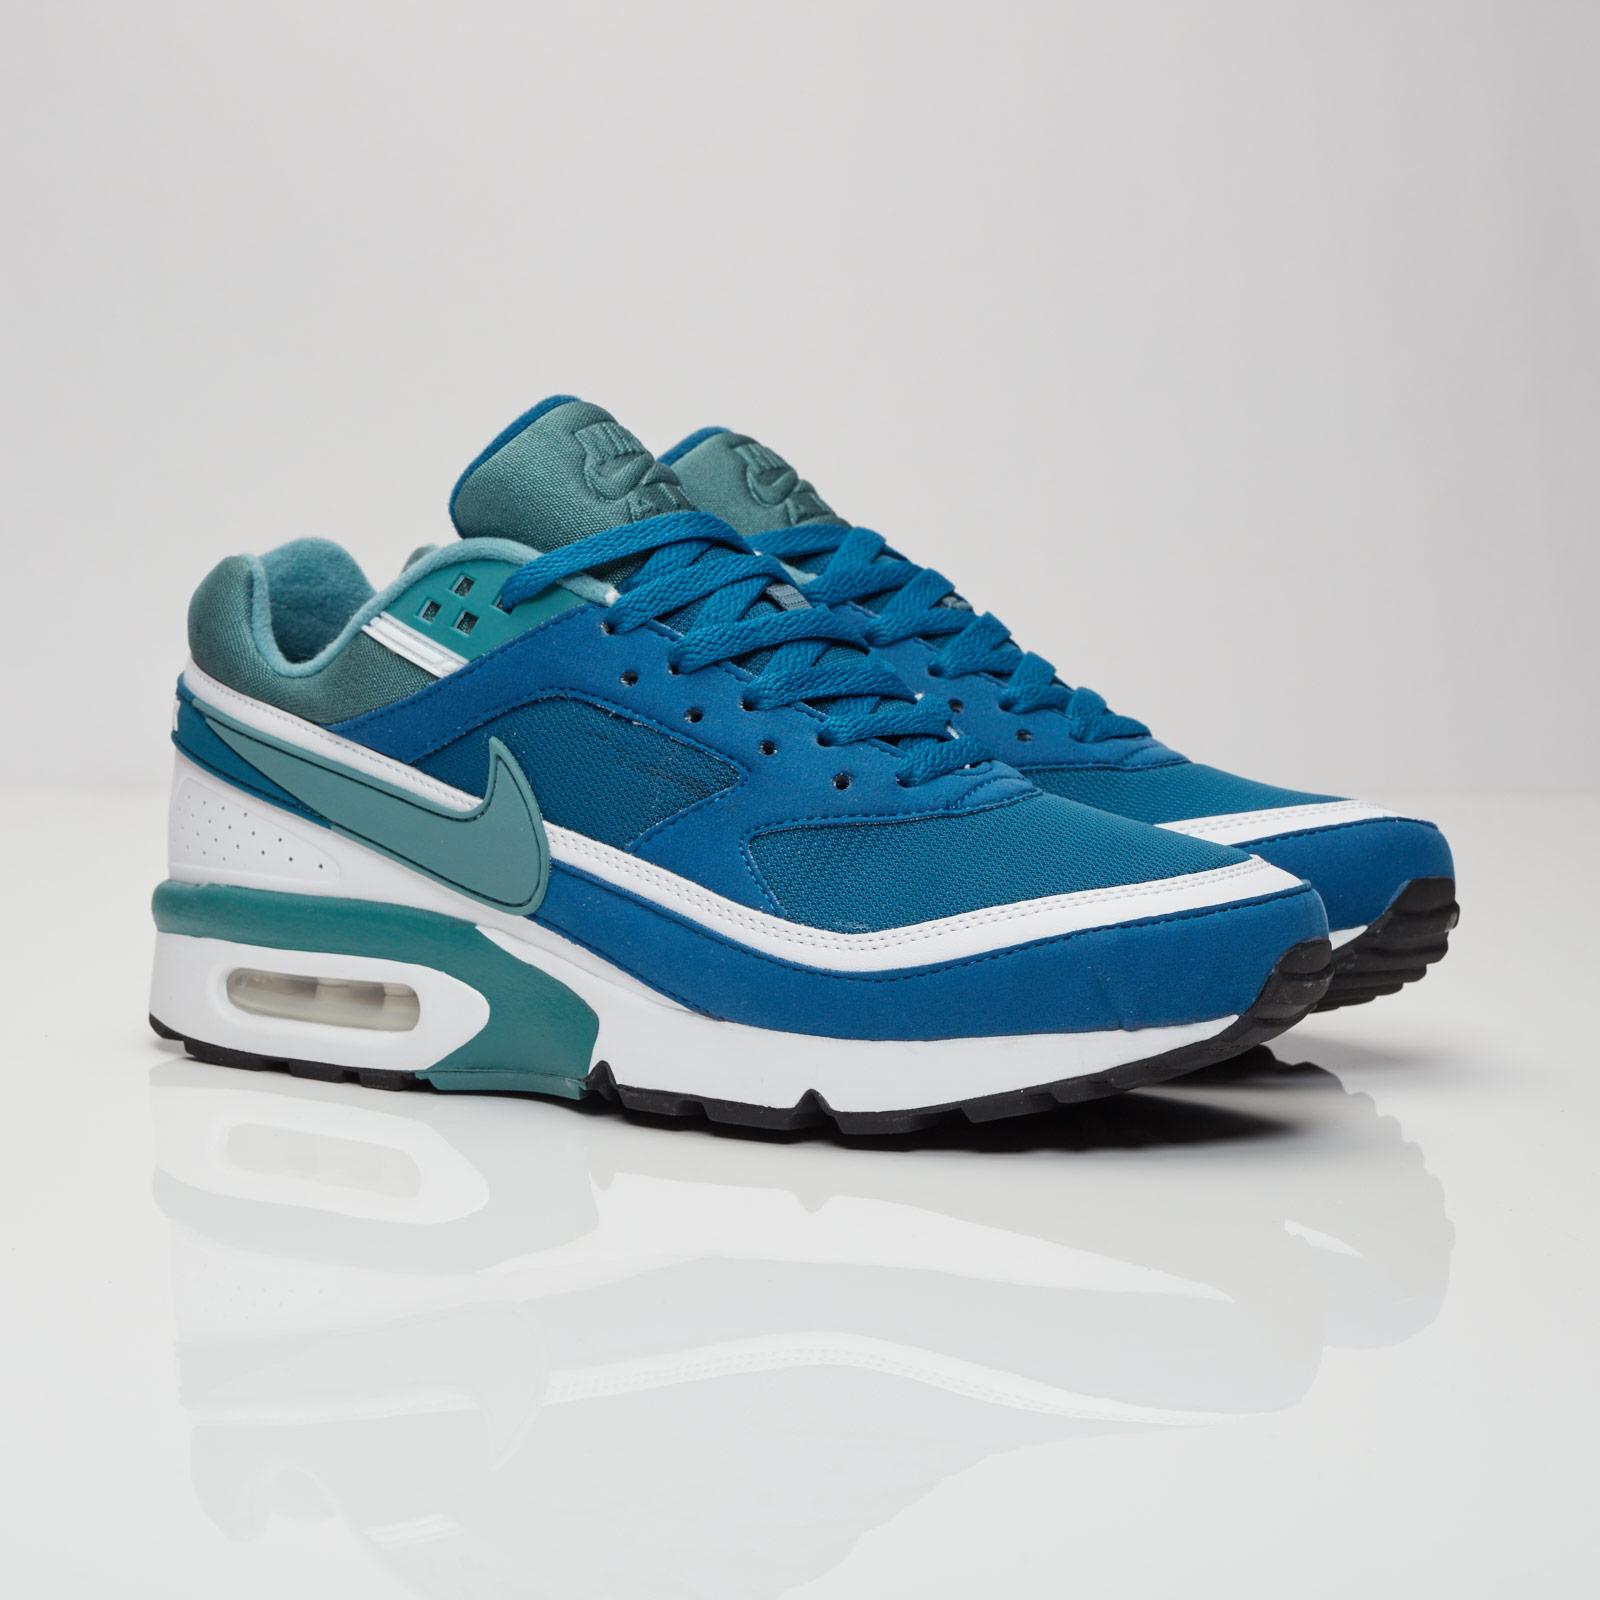 a2c7999036933 Nike Air Max BW OG - 819522-401 - Sneakersnstuff | sneakers ...